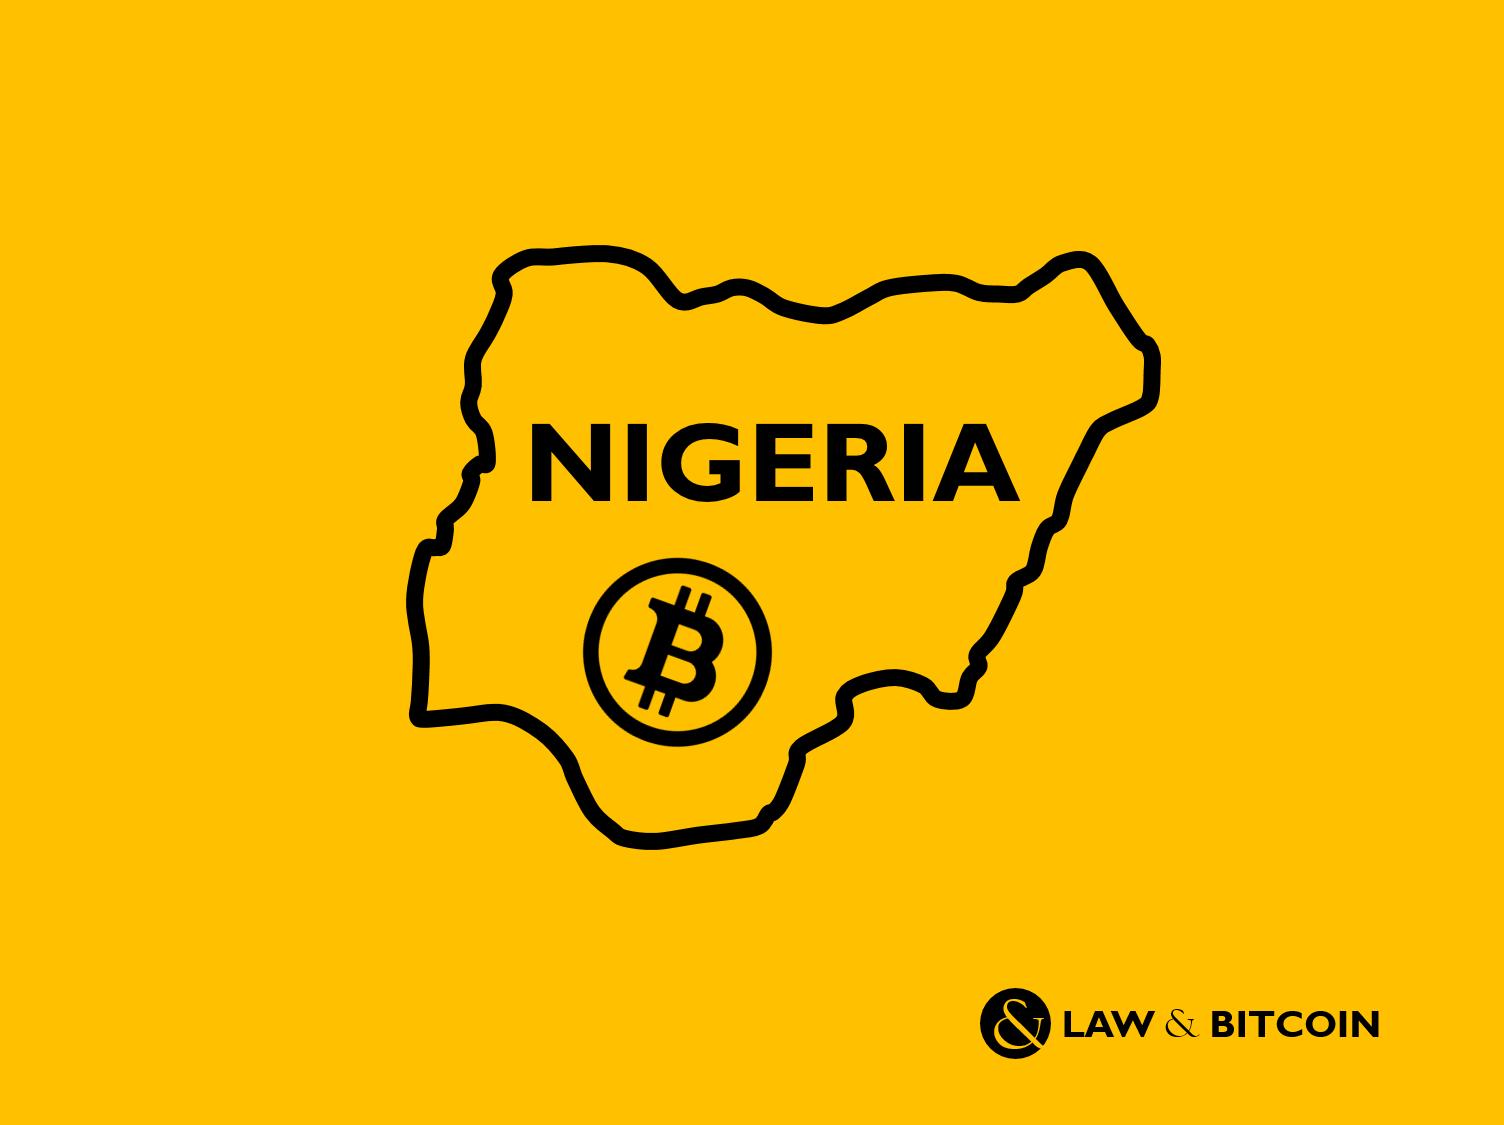 Nigeria regulación Bitcoin